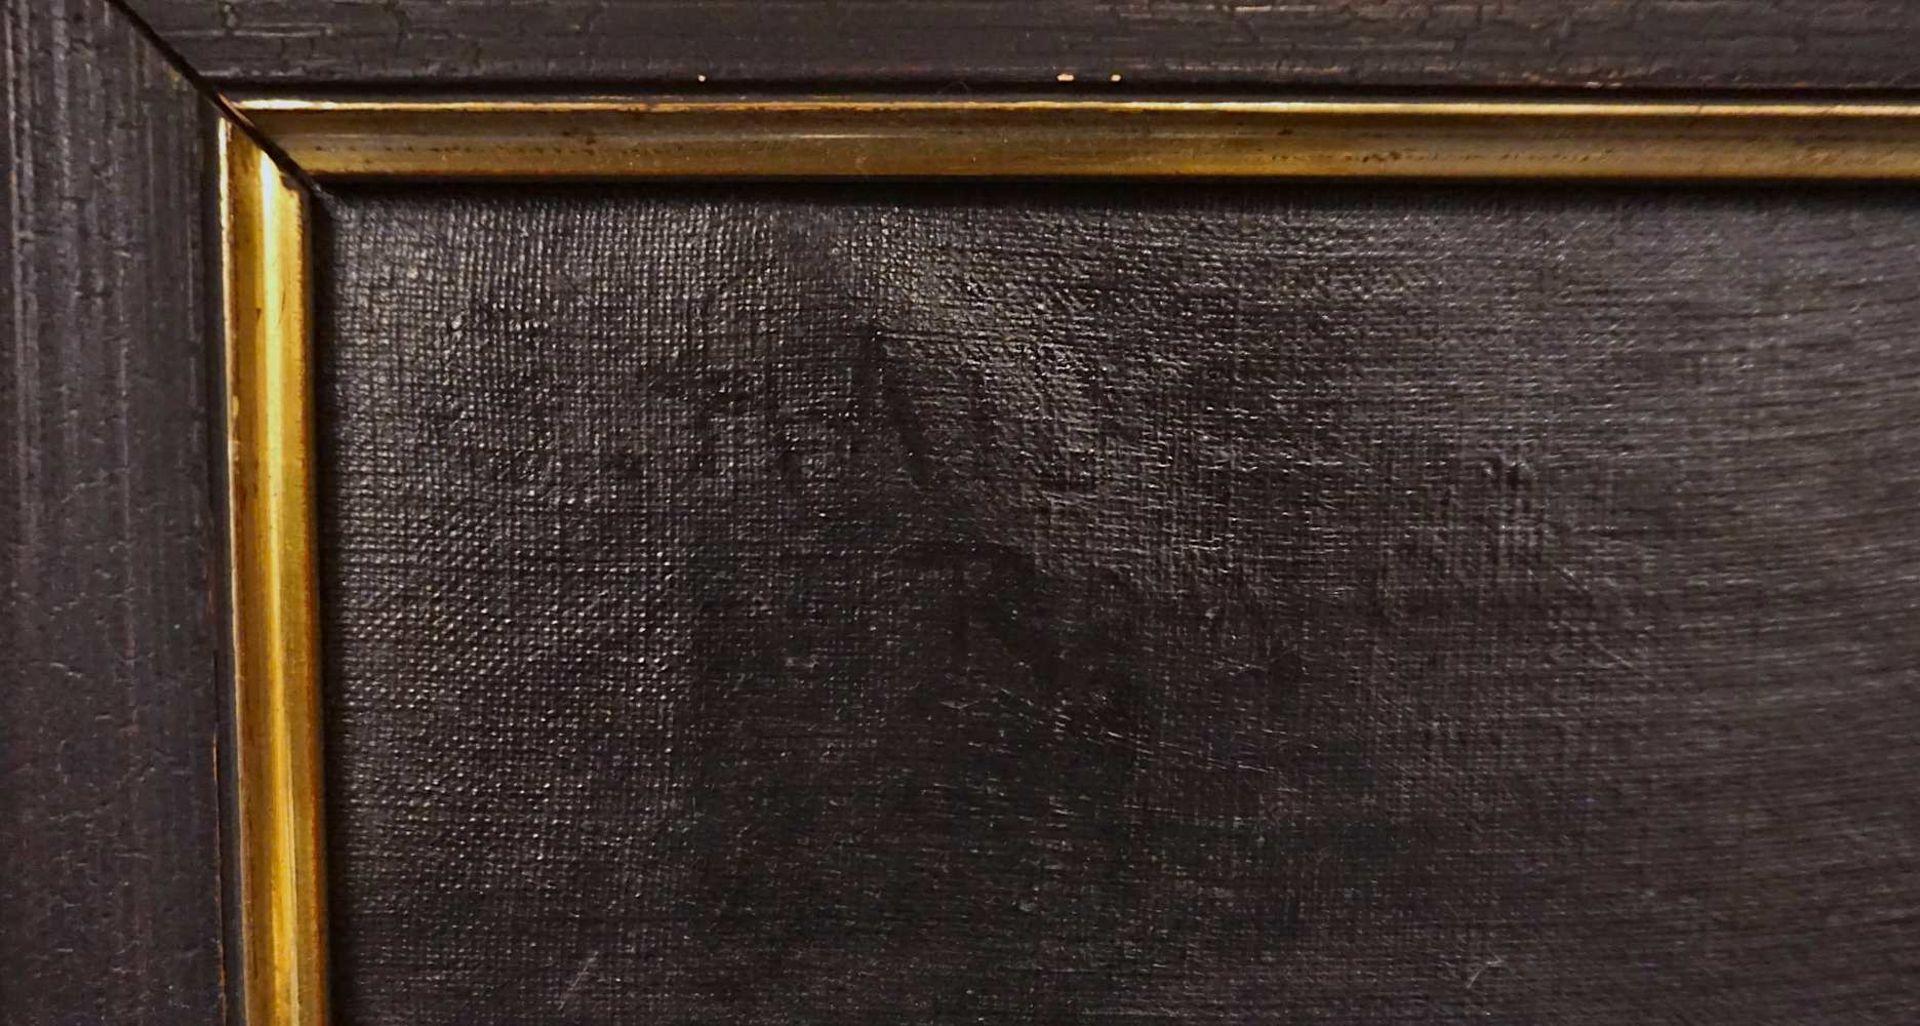 "1 Ölgemälde ""Dame mit Pelzschal"" L.o. sign. G. HAID (wohl Georg H. 1861-1935) R.o. w - Bild 3 aus 4"